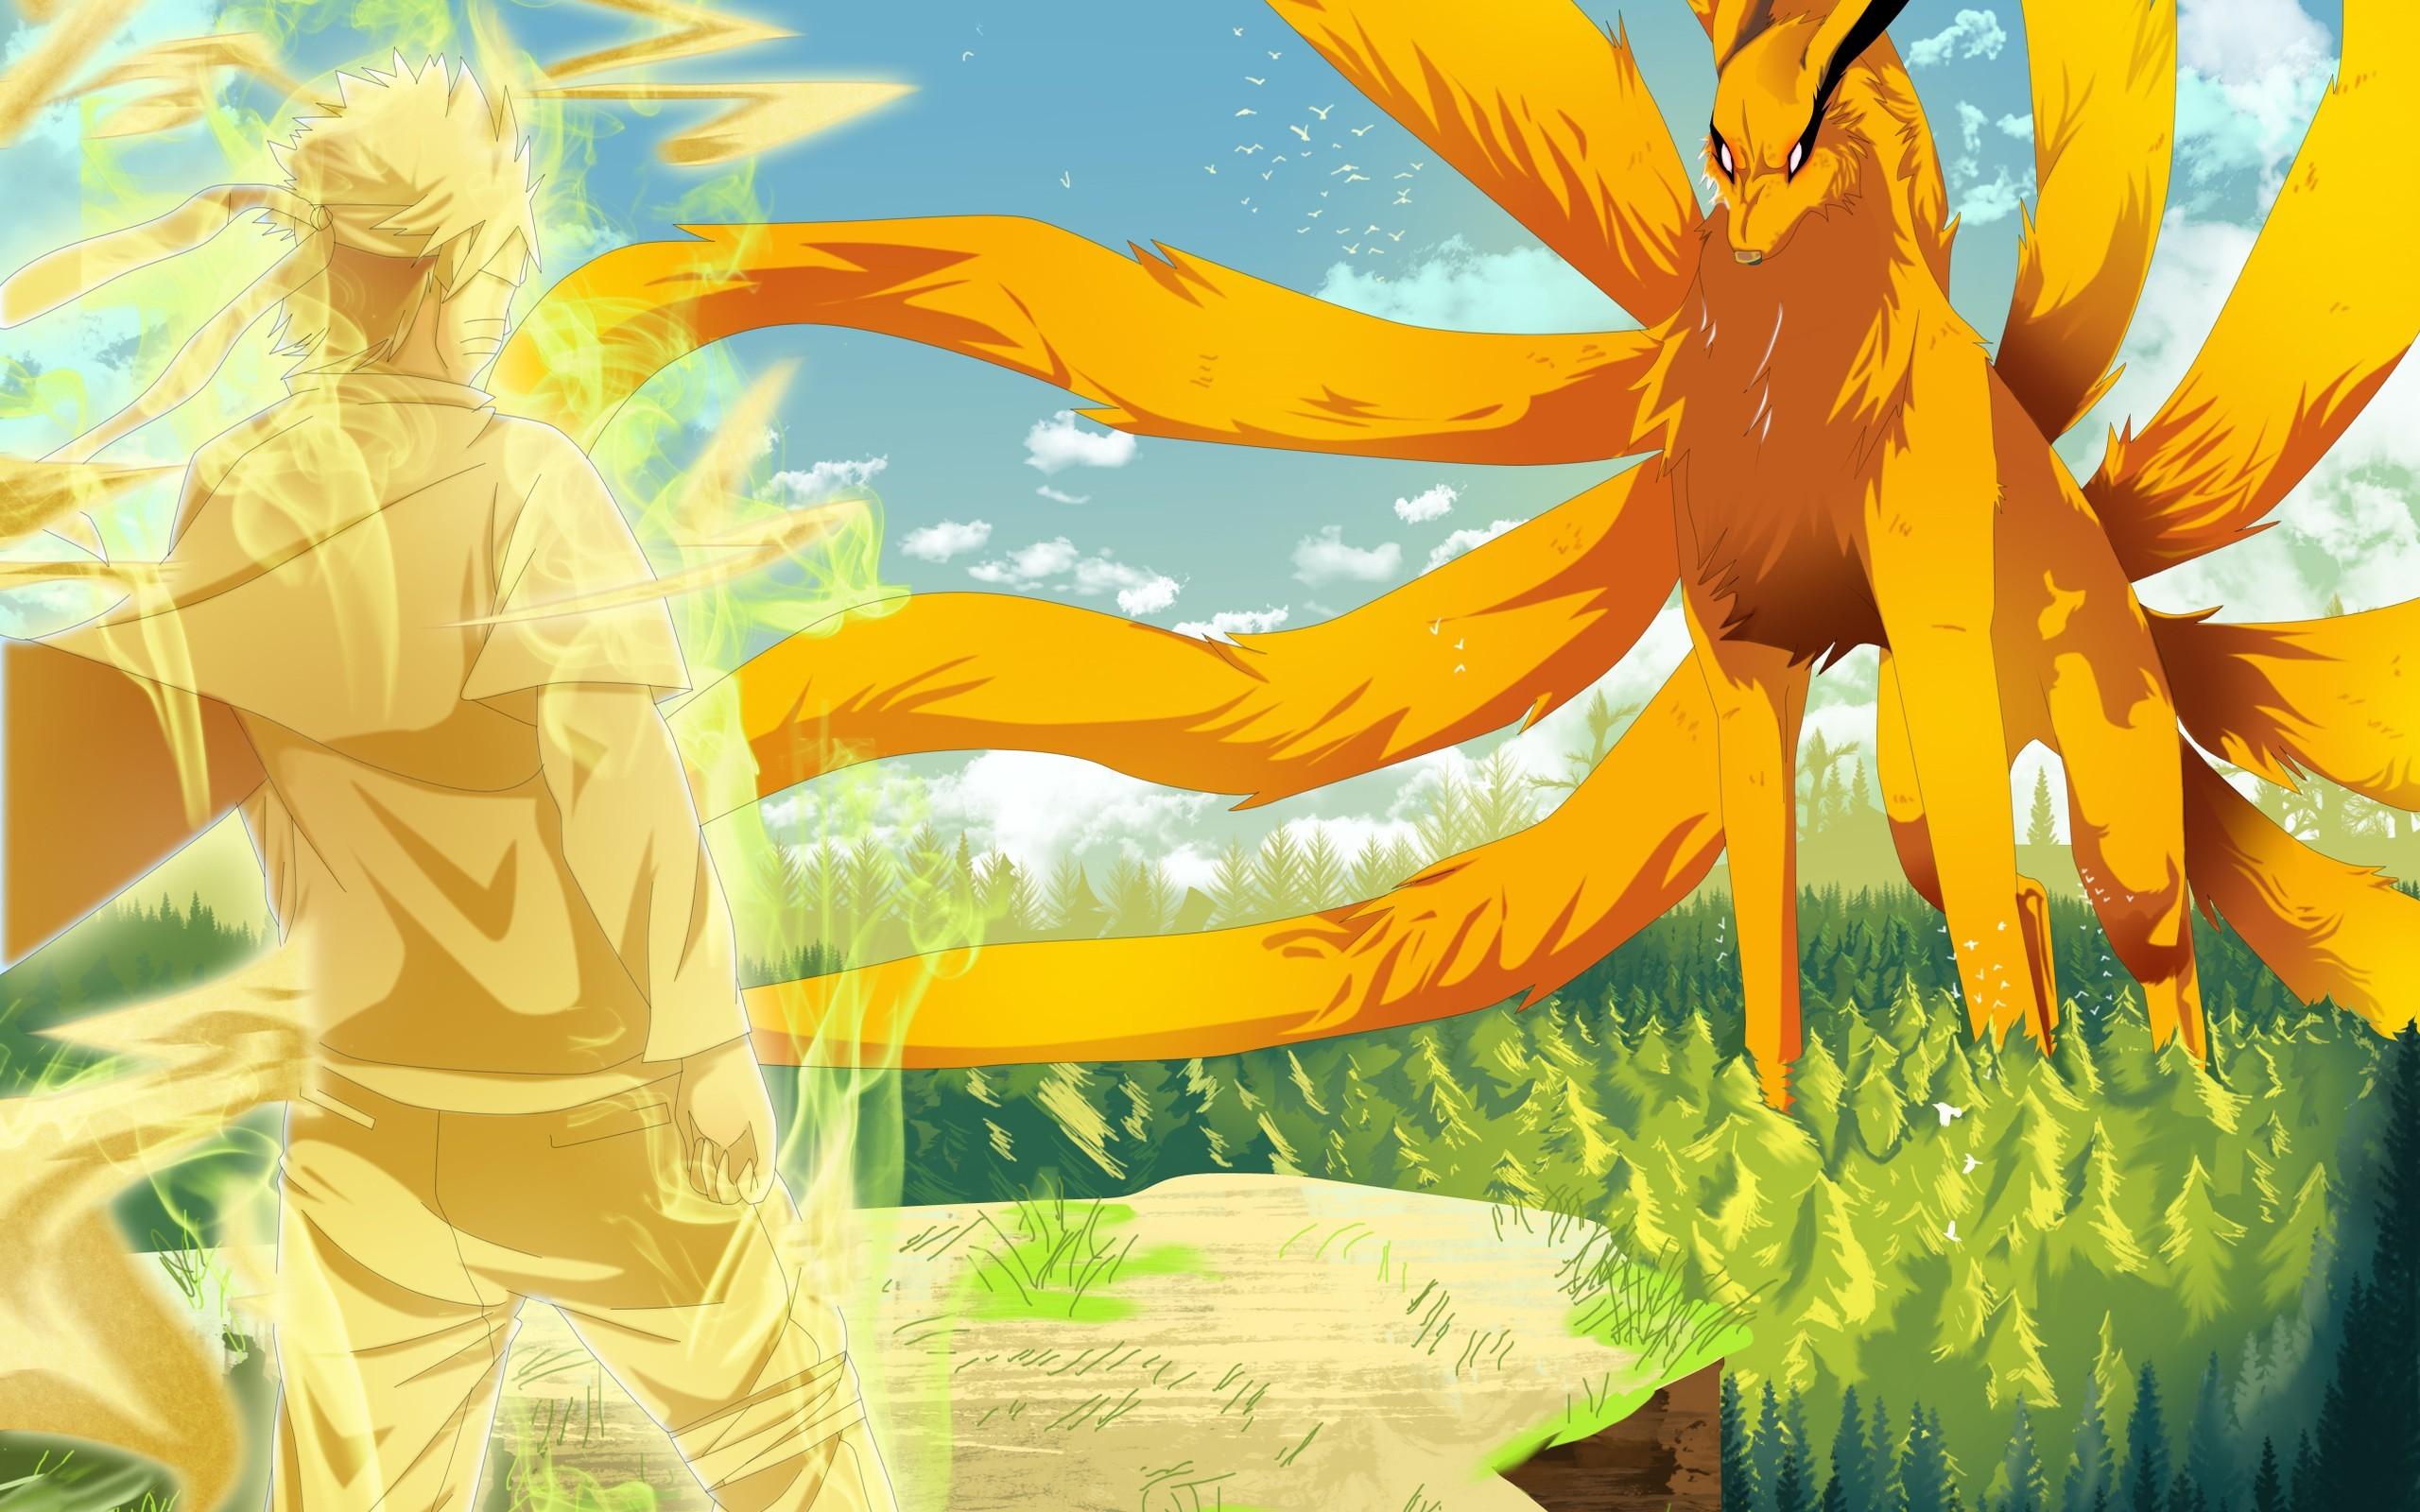 Simple Wallpaper Naruto Yellow - forest-illustration-anime-yellow-cliff-Naruto-Shippuuden-dragon-Uzumaki-Naruto-mythology-Kyuubi-flower-flora-screenshot-197578  Gallery.jpg